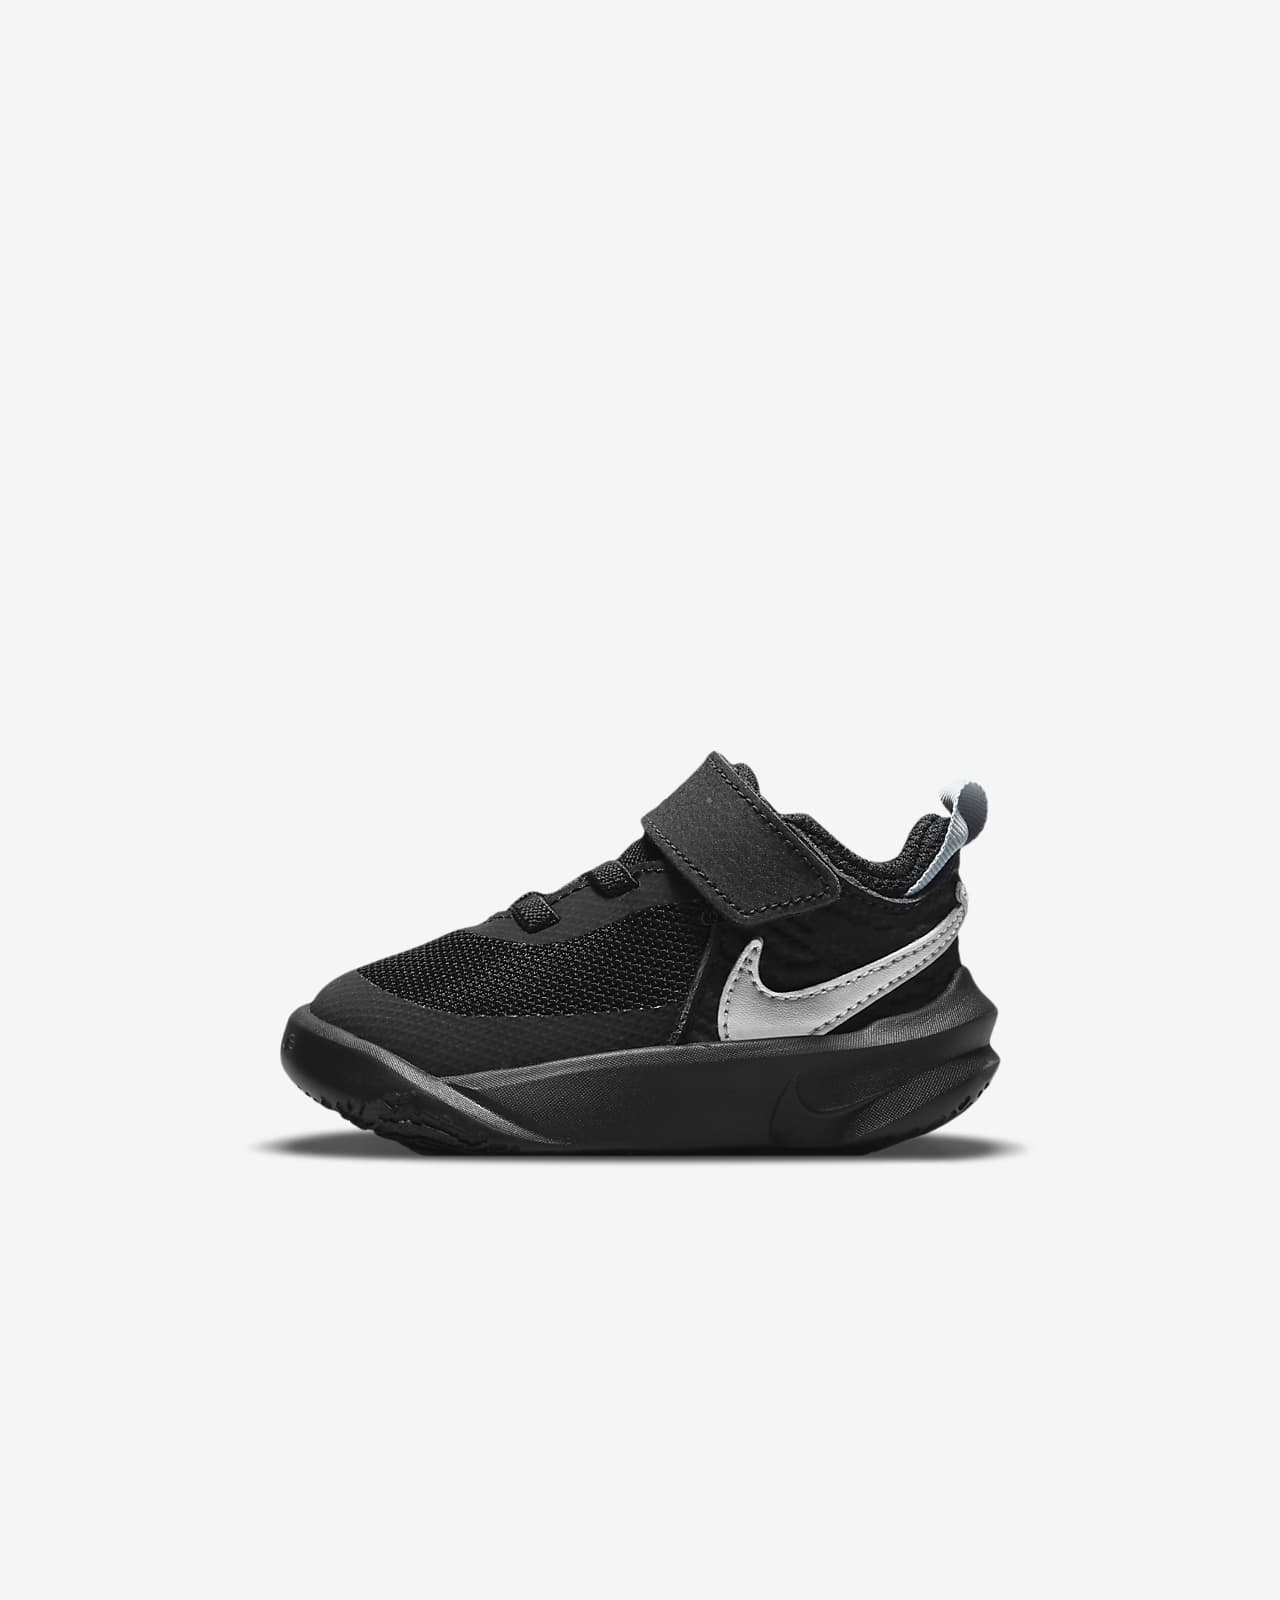 Nike Team Hustle D 10 Baby & Toddler Shoe